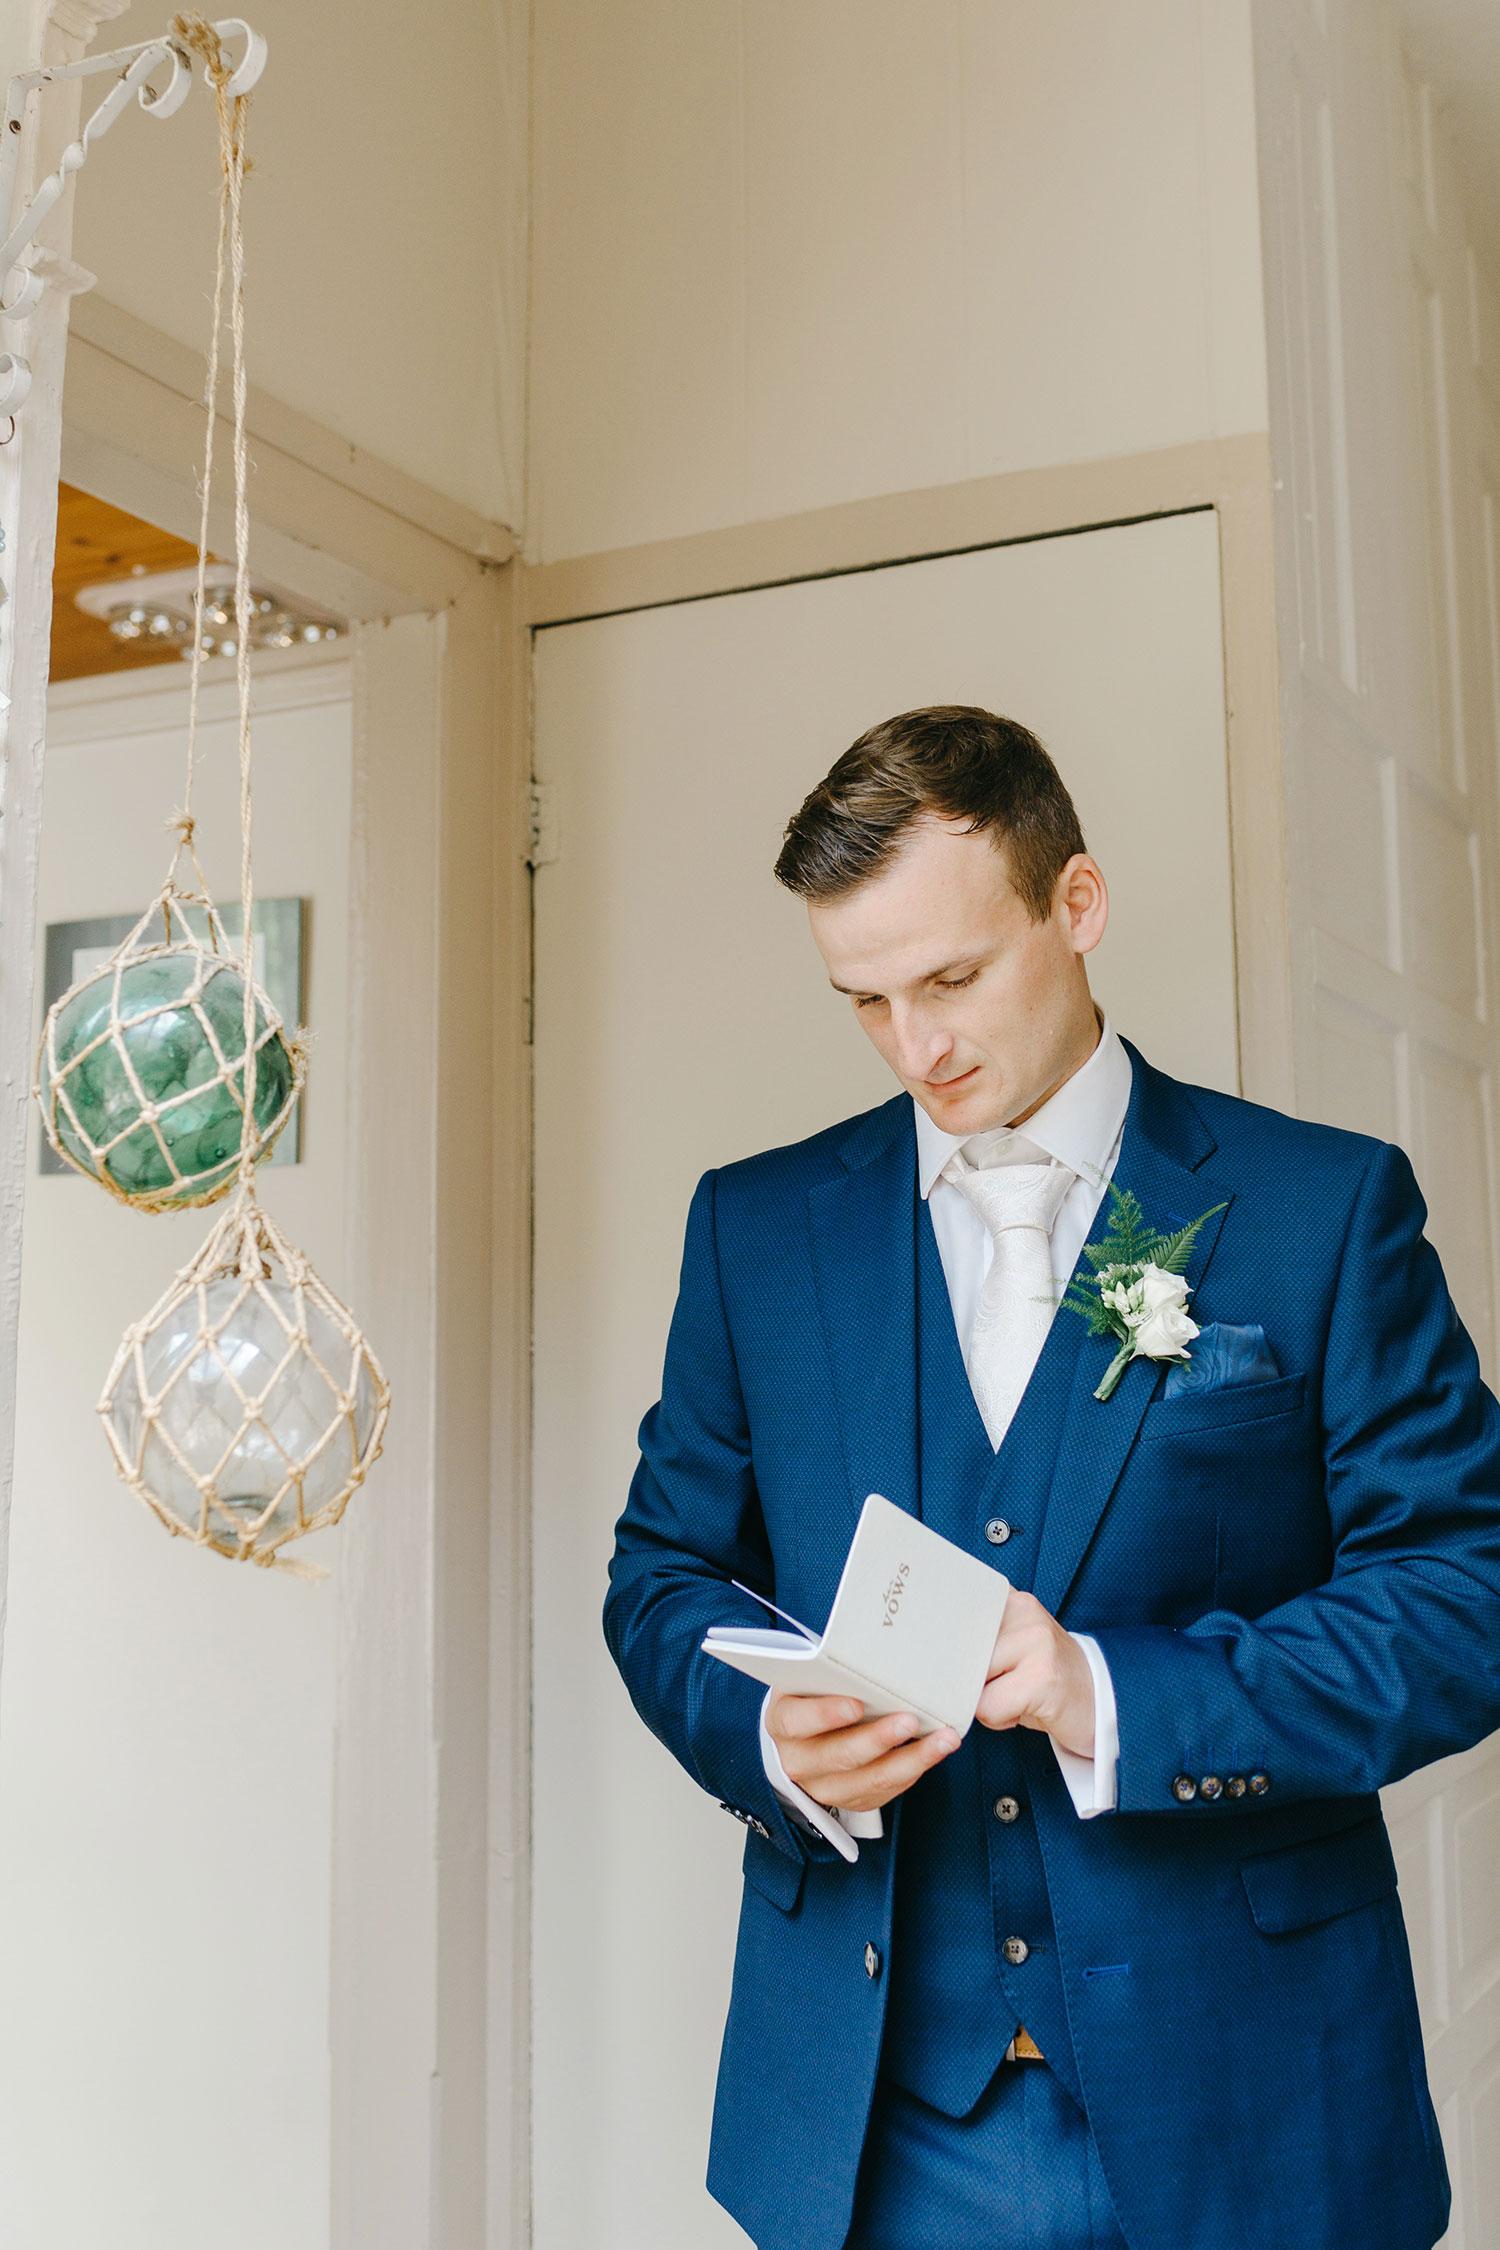 destination-wedding-photographer-ballinacurra-house-wedding-20180711_0016.jpg